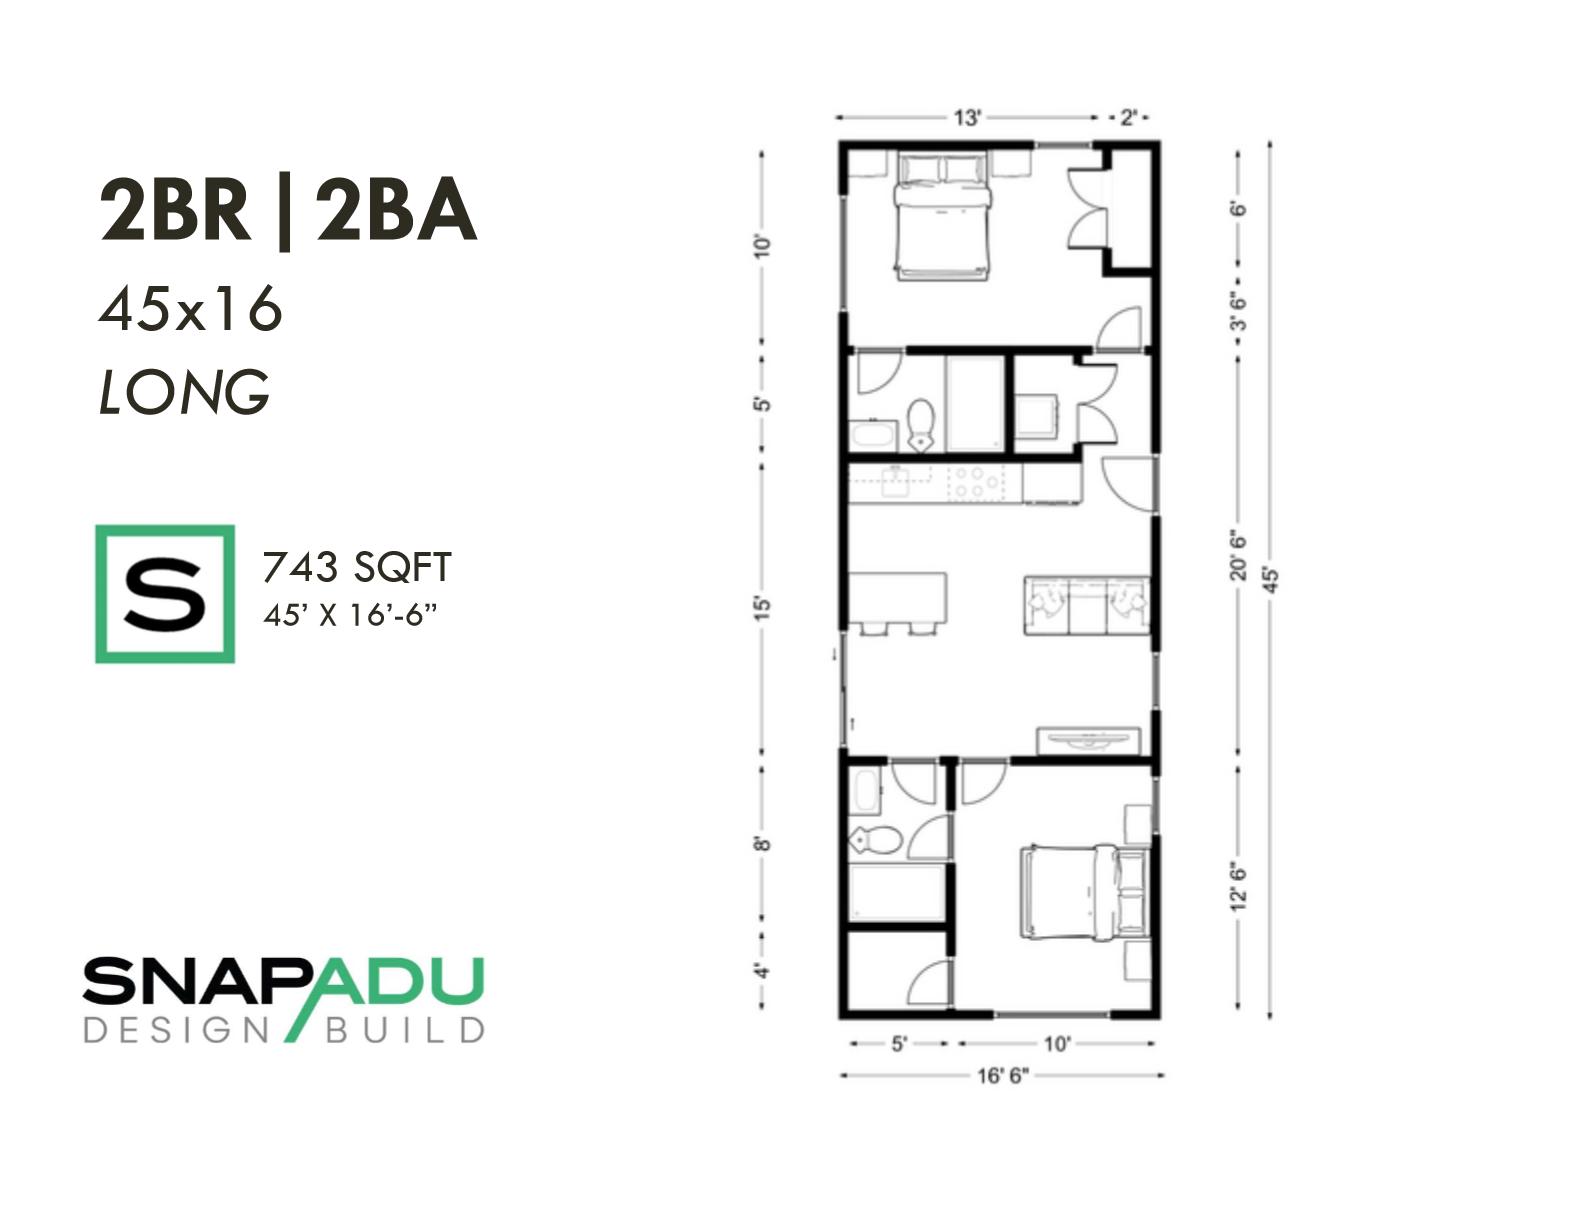 2BR 2BA 750 sqft 45x16 LONG ADU floor plan